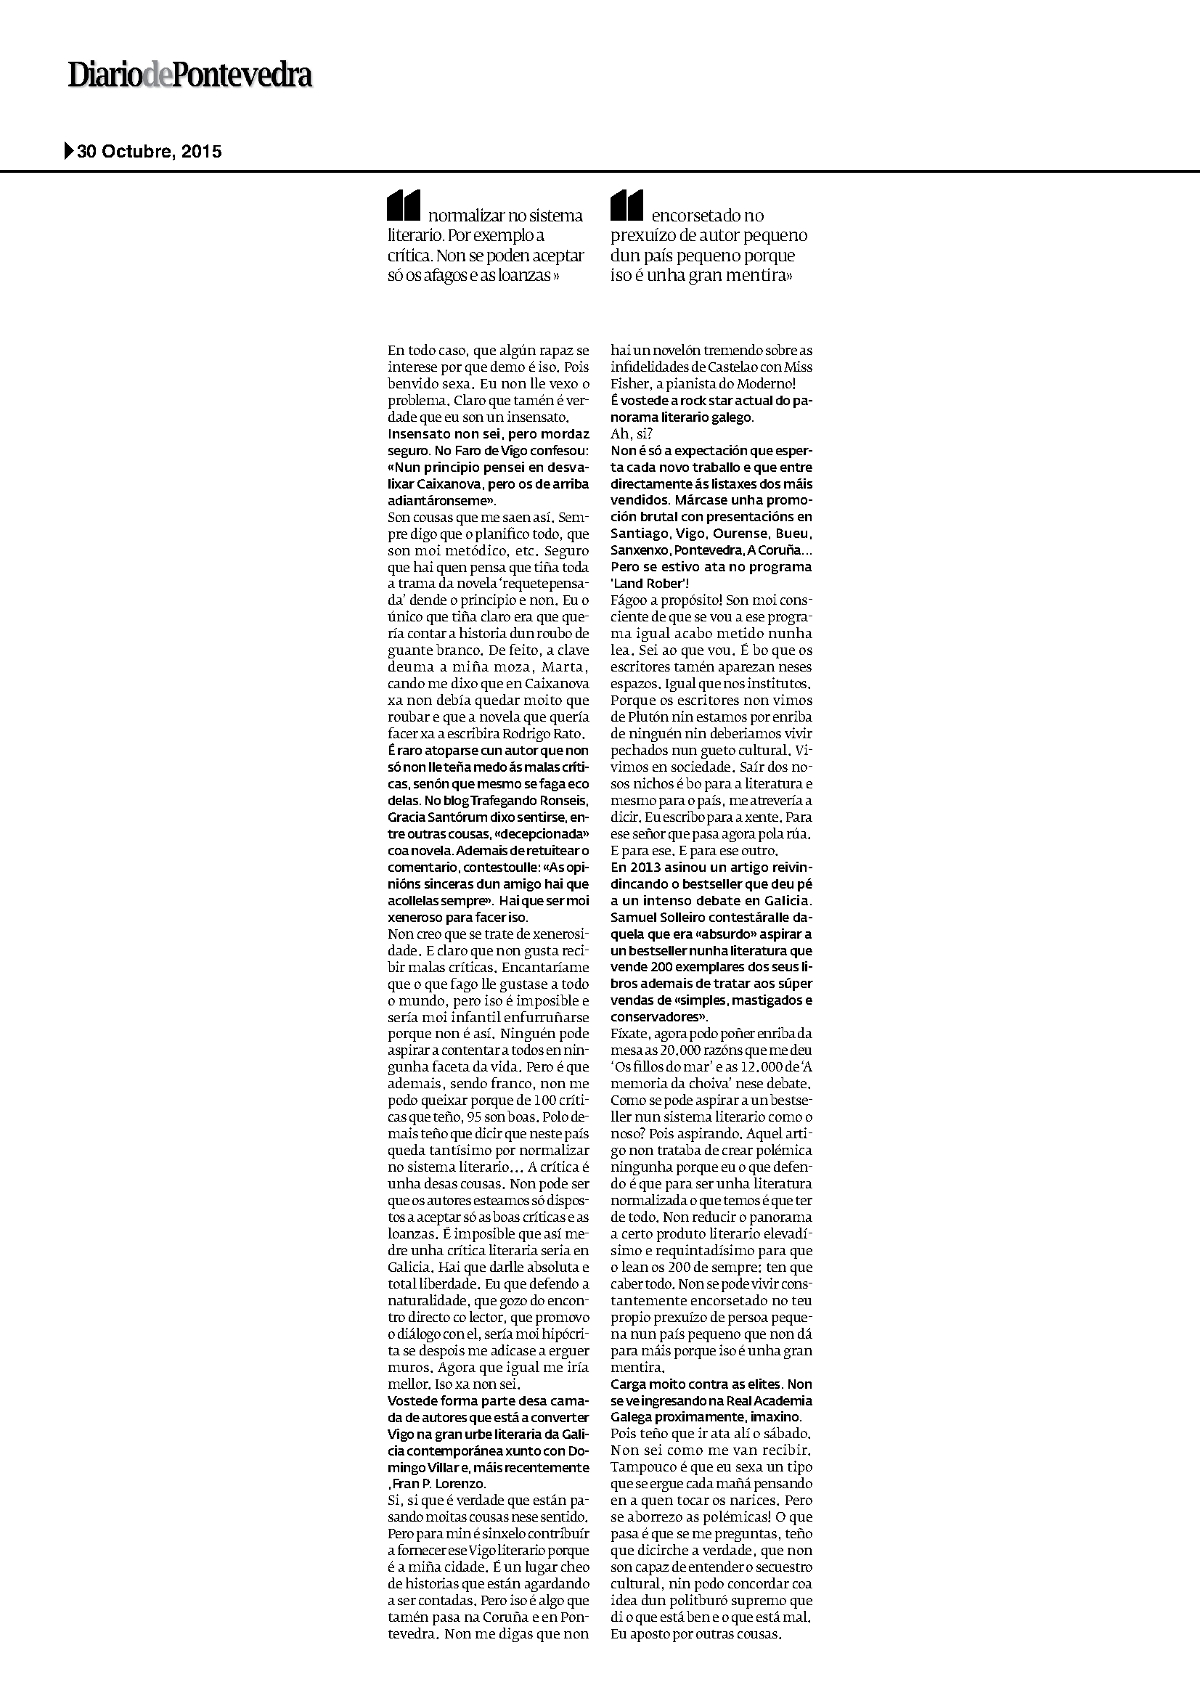 Pedro Feijoo entrevista DP 2